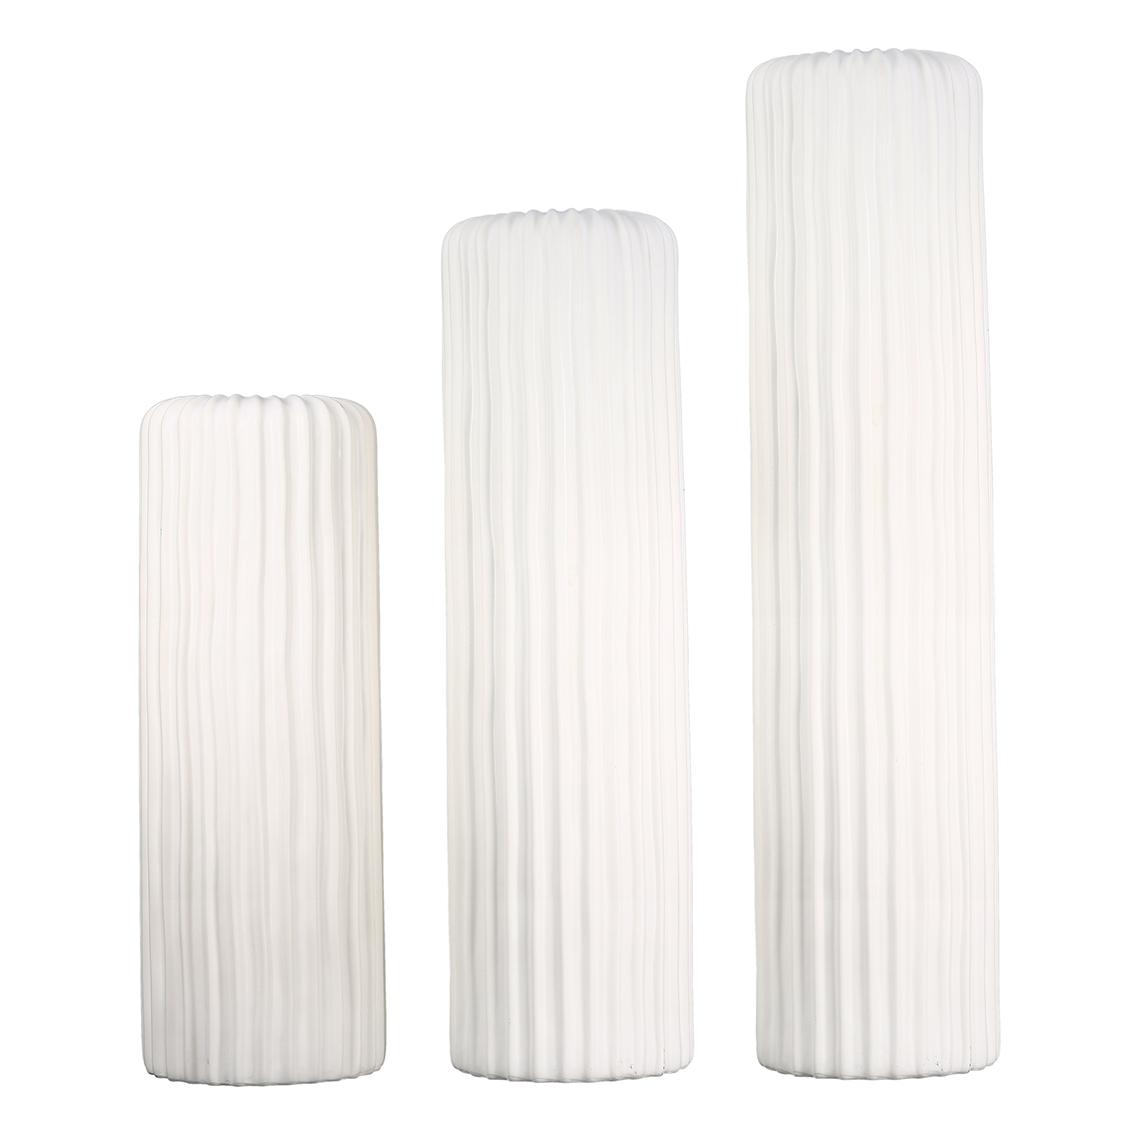 Porcelánová váza Elias, 46 cm, bílá